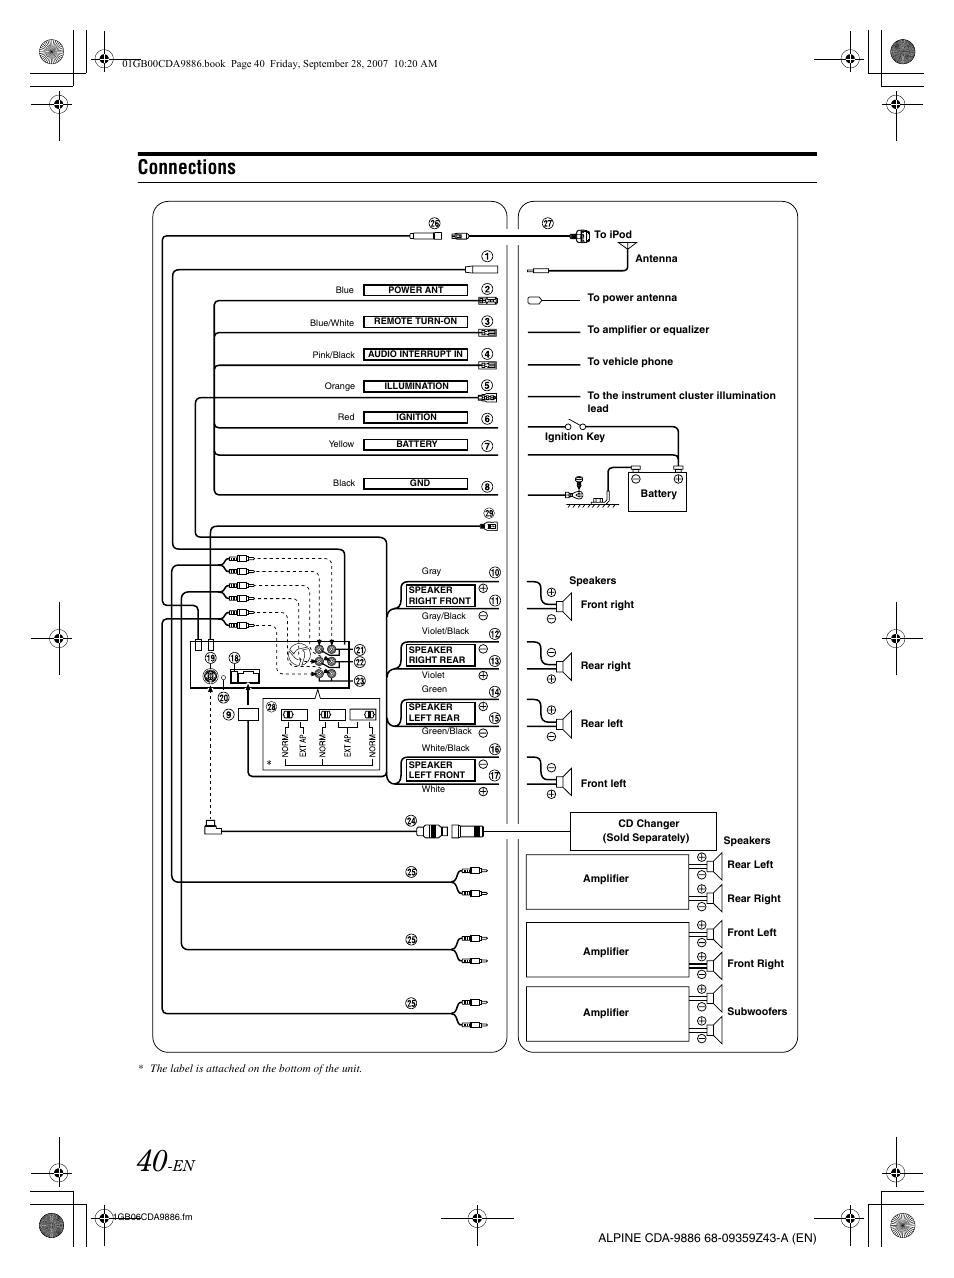 medium resolution of connections alpine cda 9886 user manual page 42 88 original mode alpine cda 9884 at alpine cda 9886 wiring diagram